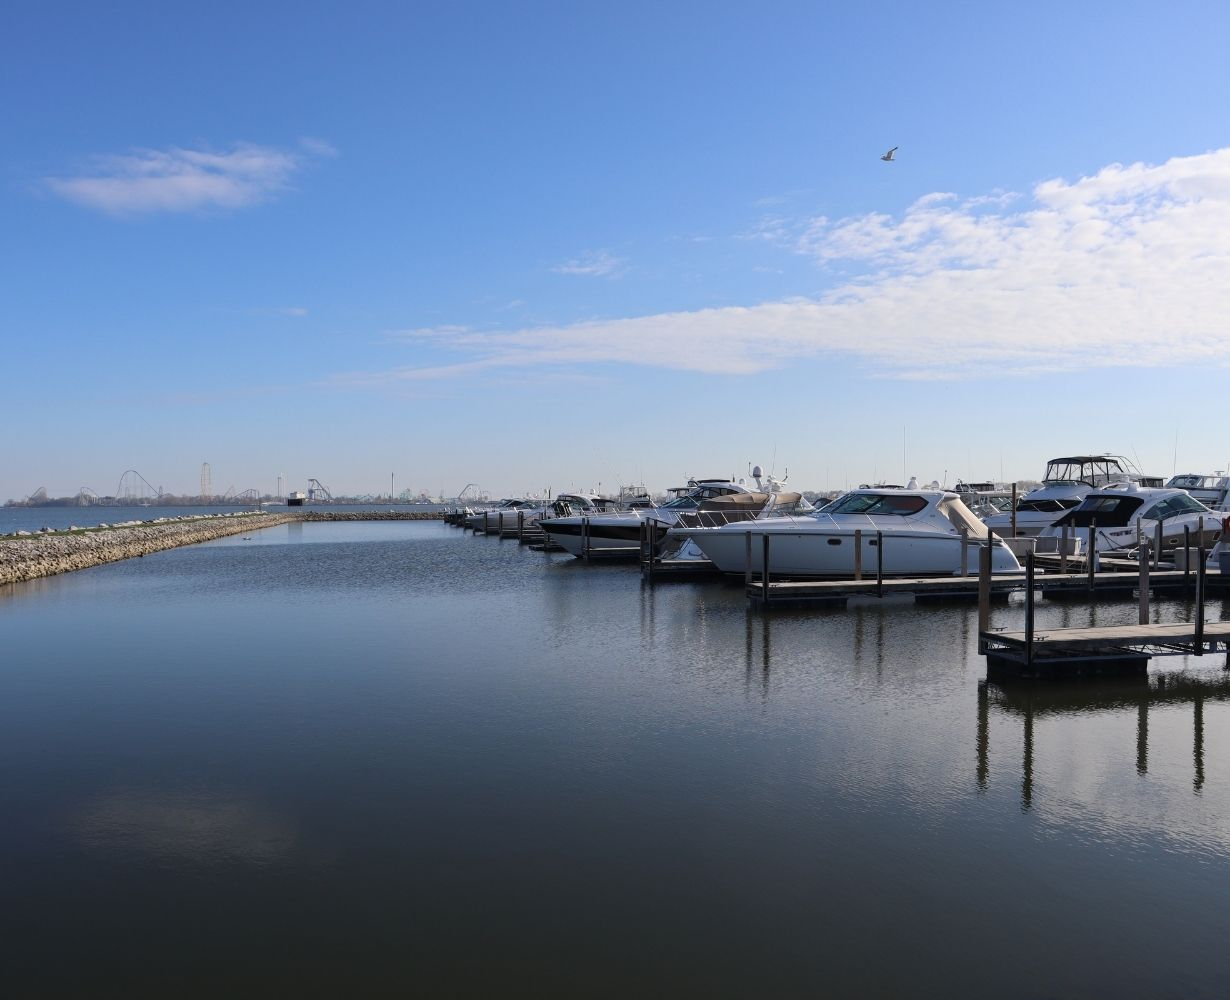 son-rise-marina-sandusky-ohio-gallery-docks-4